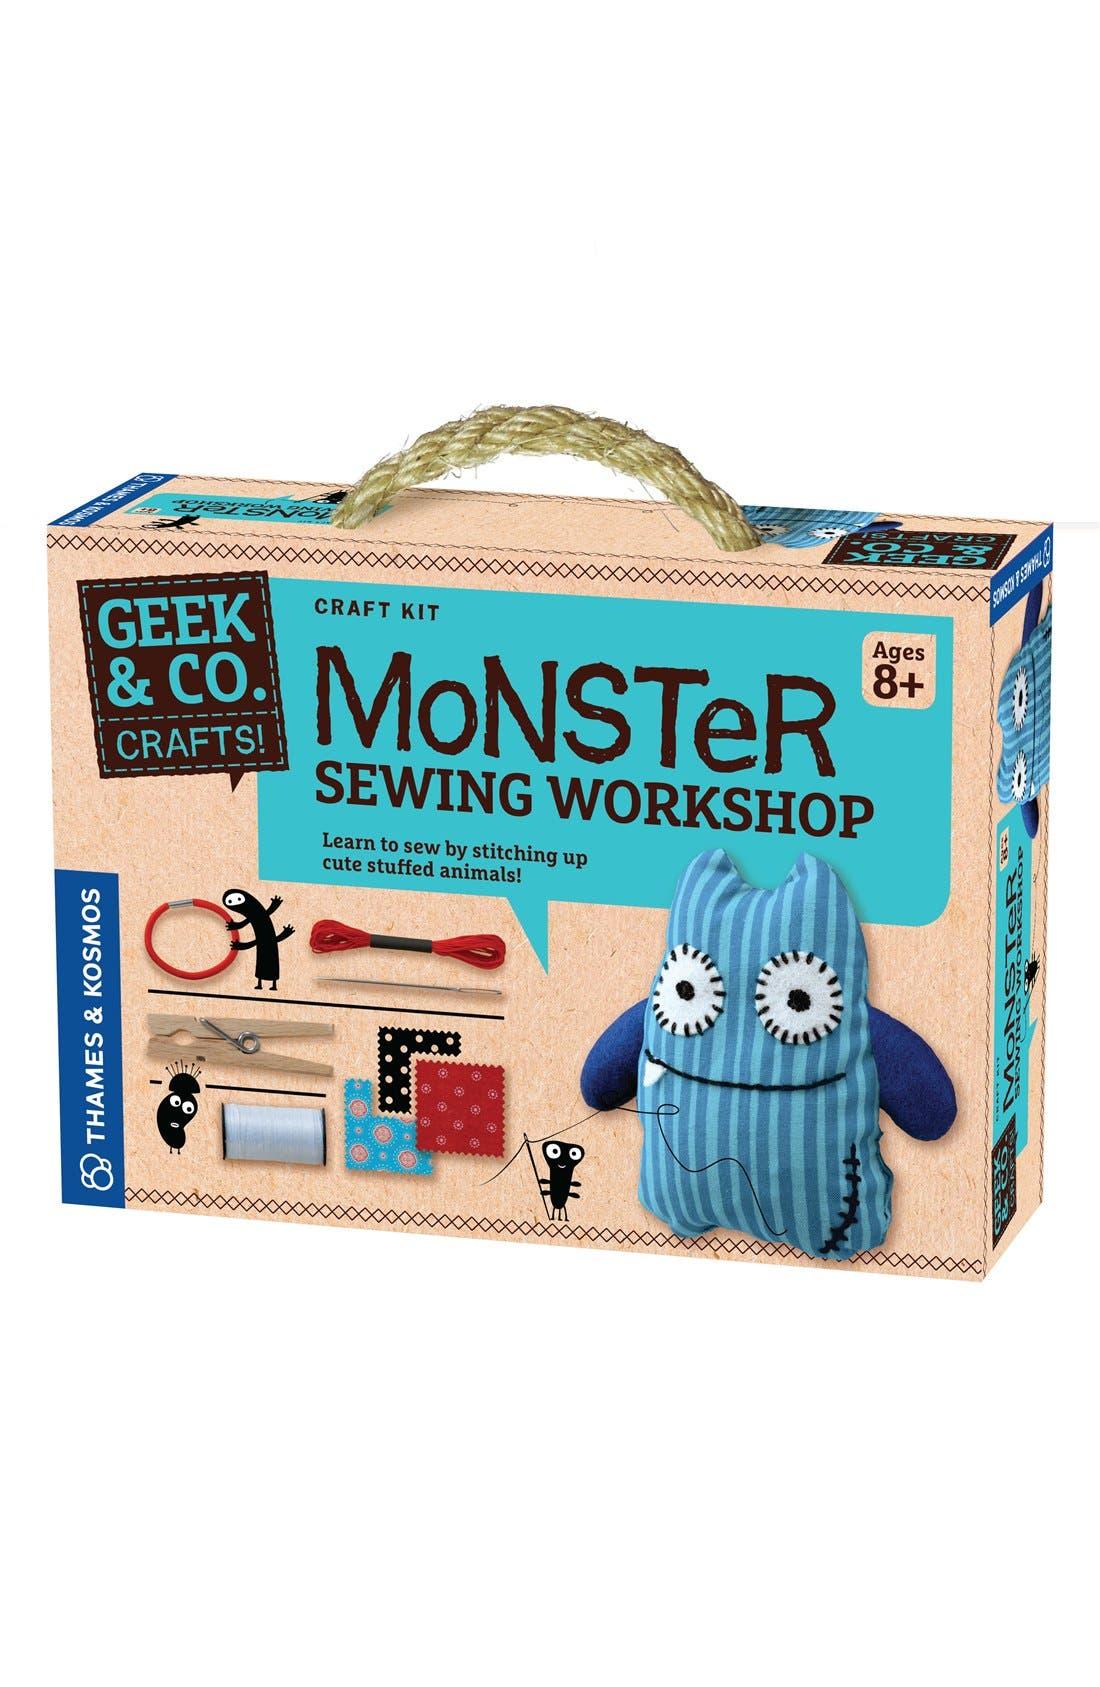 Thames & Kosmos 'Monster Sewing Workshop' Sewing Starter Kit